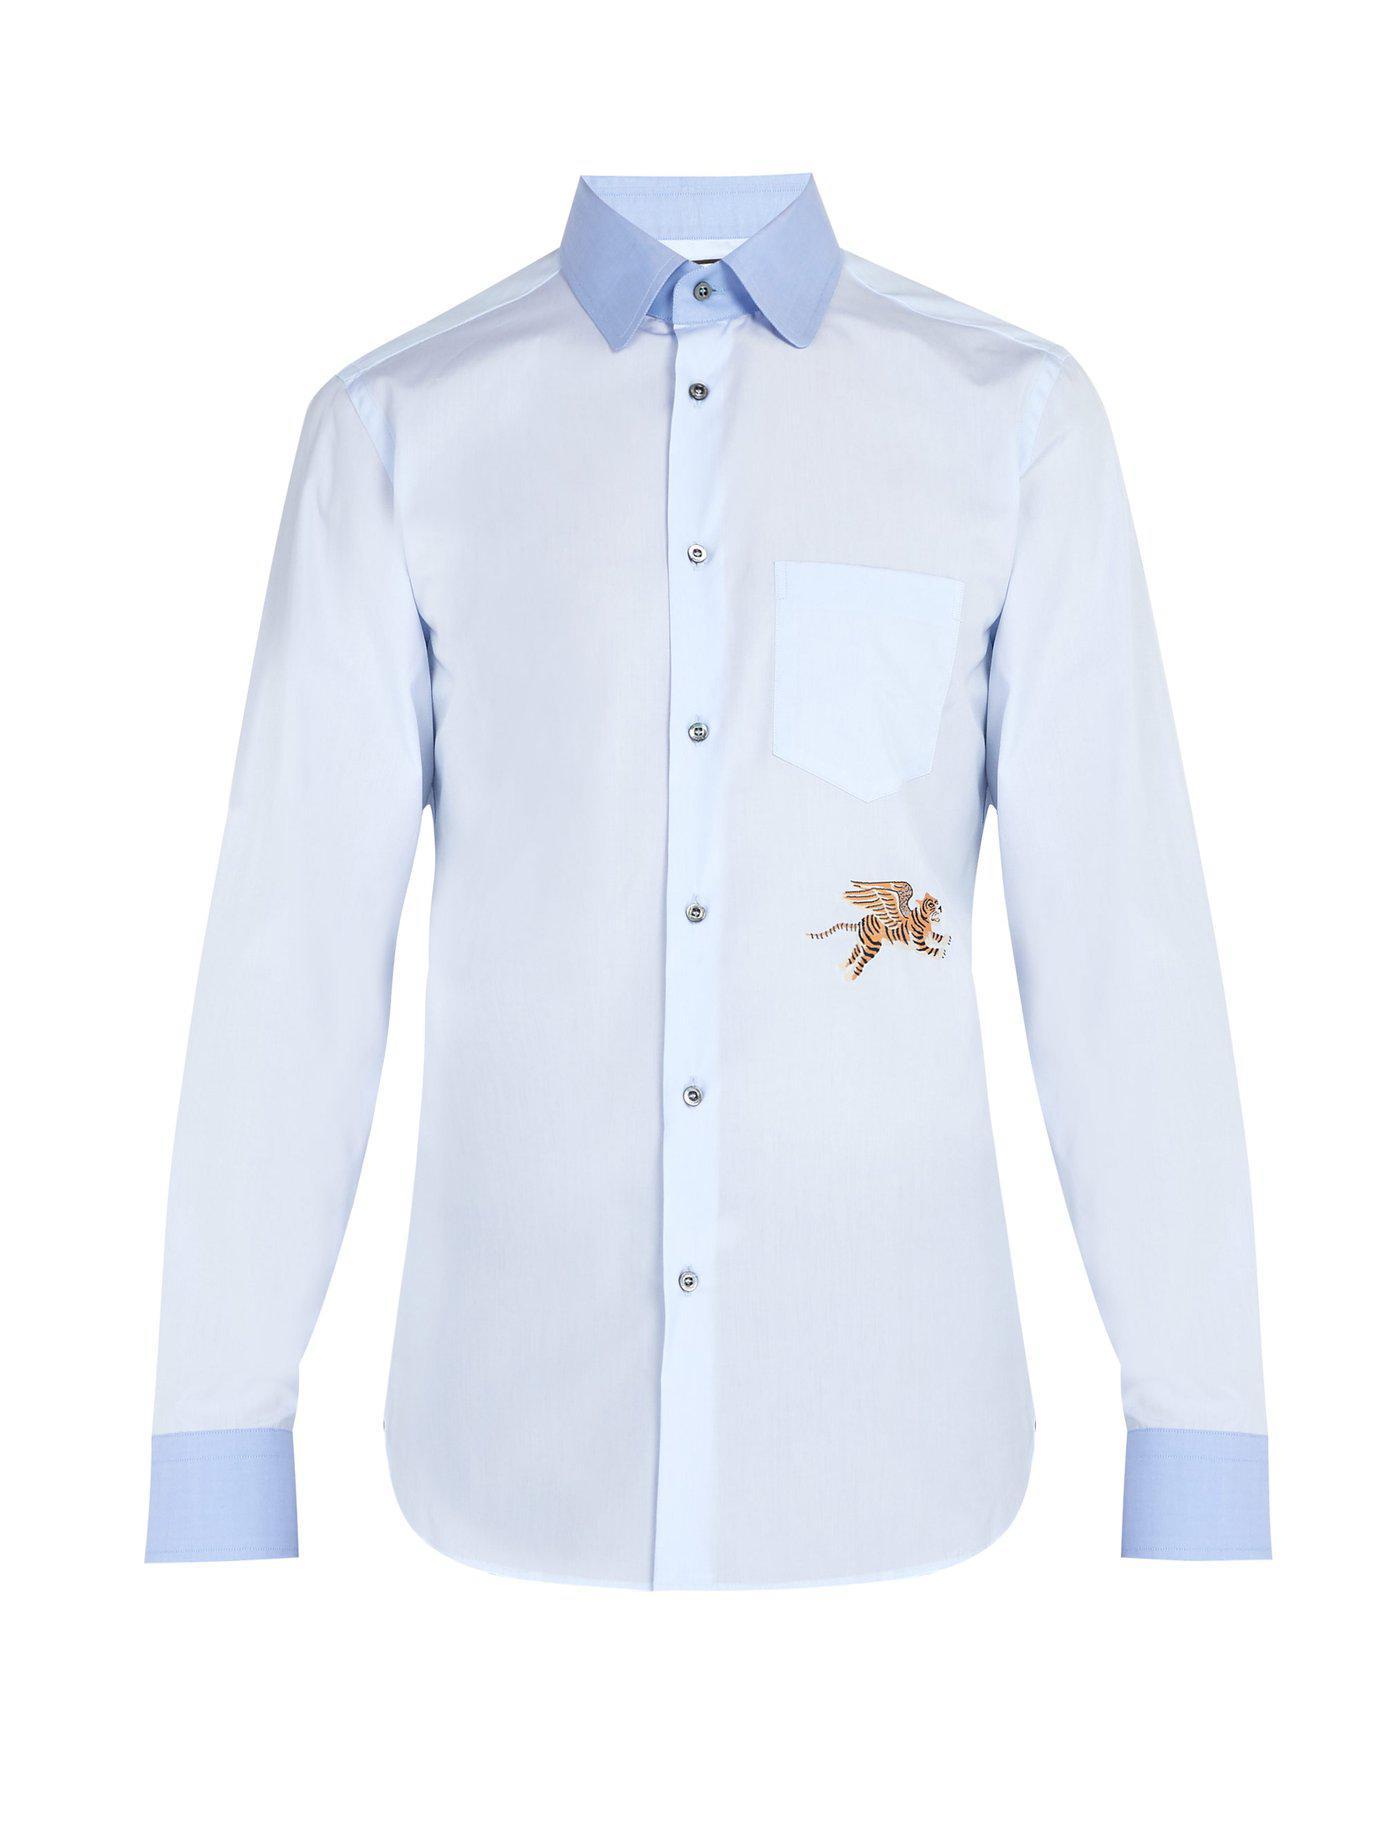 8aea0873b1d Lyst - Gucci Flying Tiger Cotton Poplin Shirt in Blue for Men